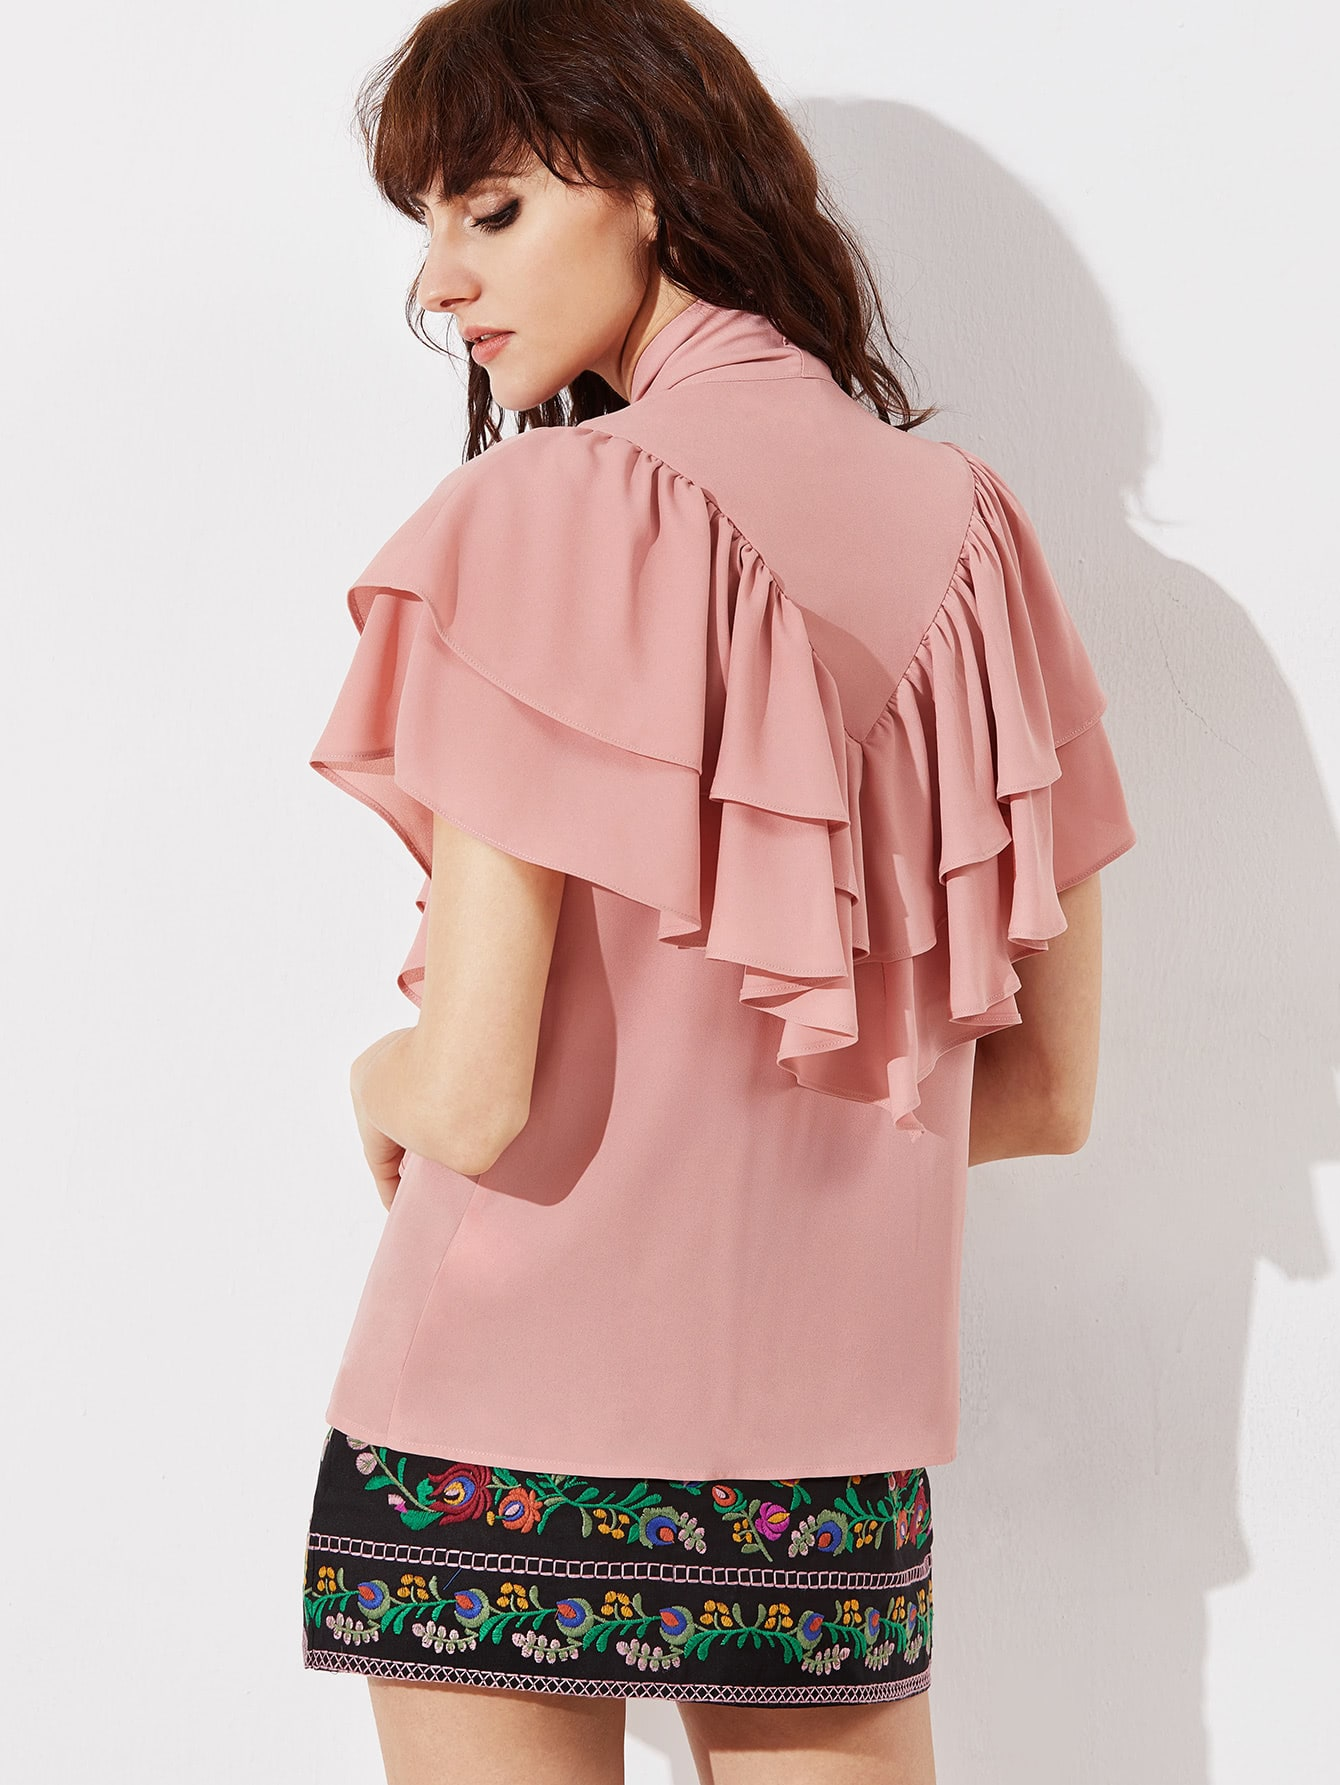 blouse161229705_2